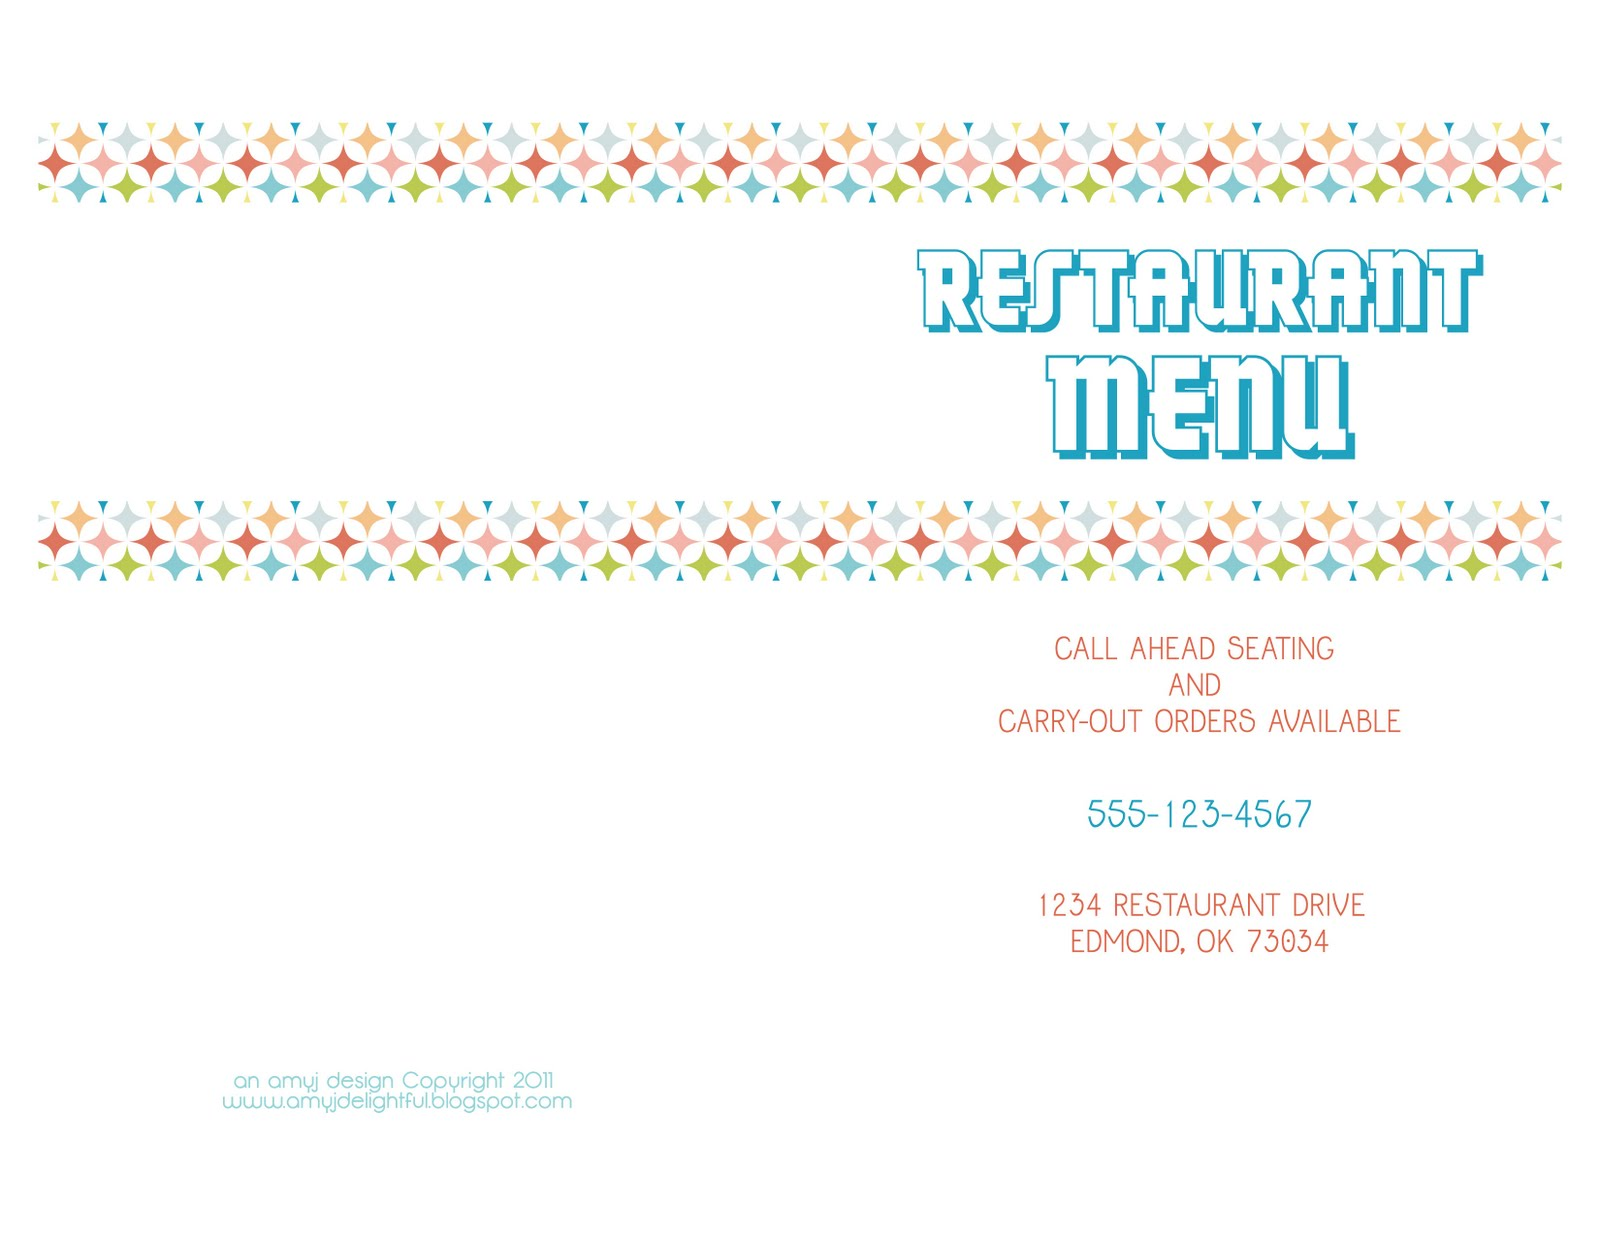 Amy J Delightful Blog Printable Menus For Playing Restaurant